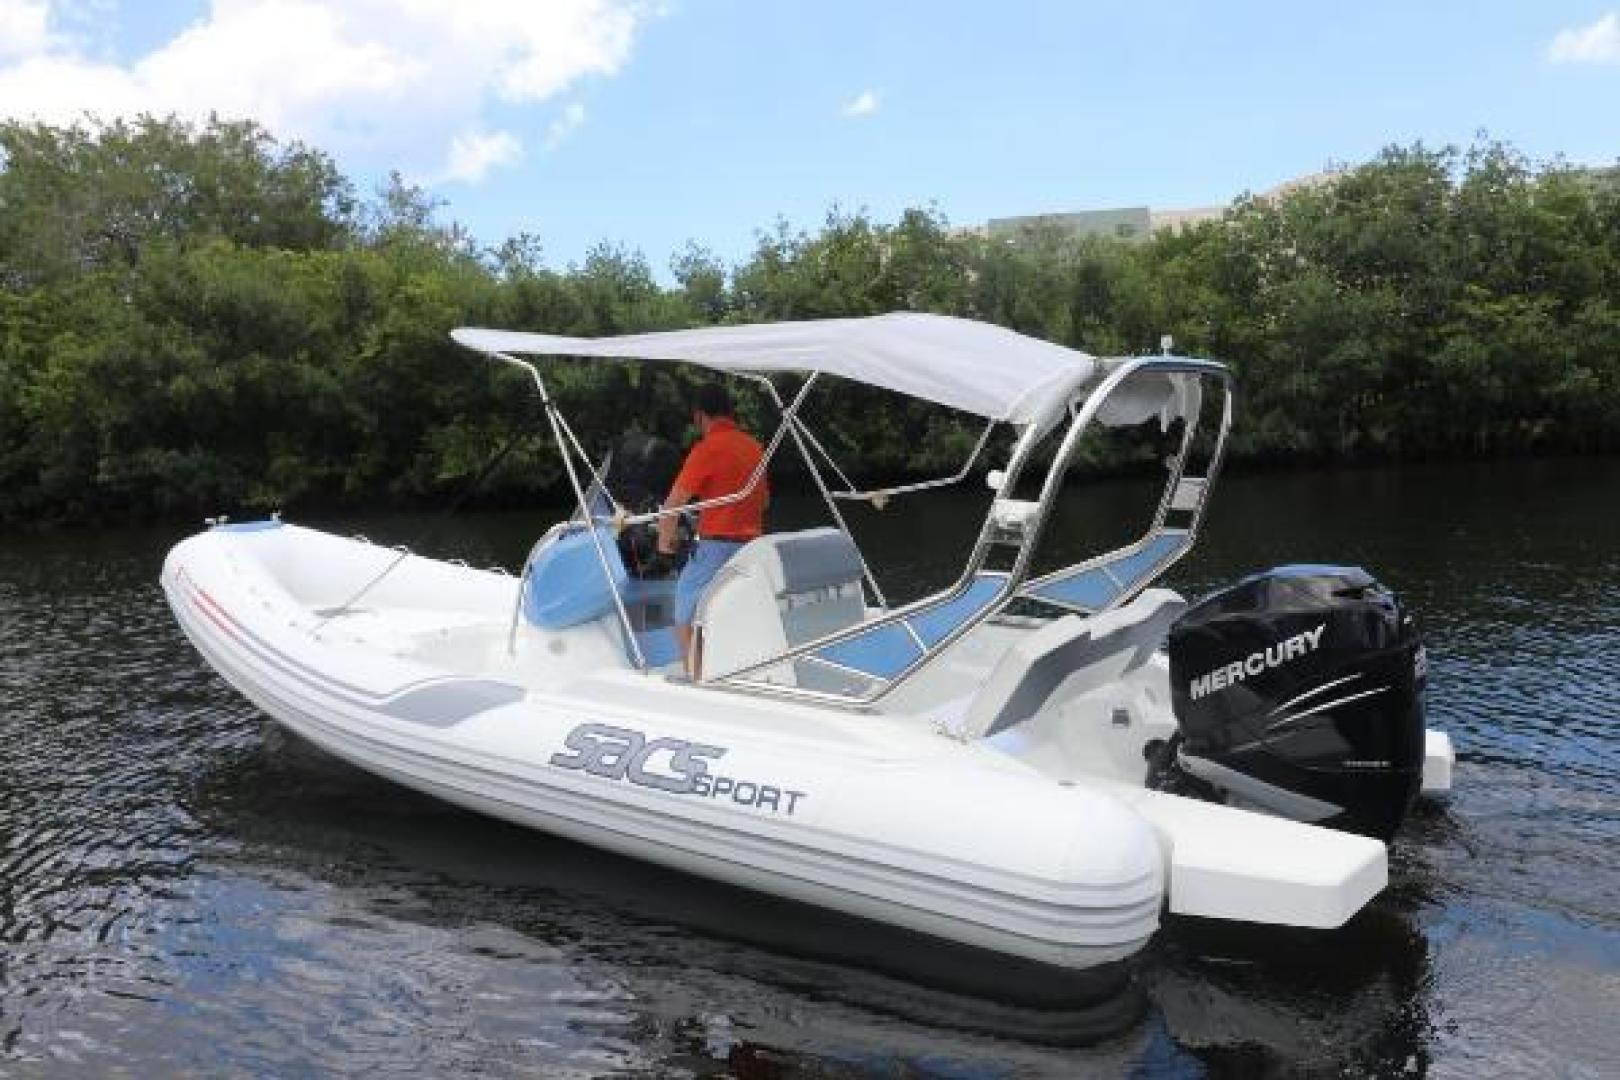 Sacs-Sport 700 2016-Sacs Sport 700 Fort Lauderdale-Florida-United States-1521564 | Thumbnail